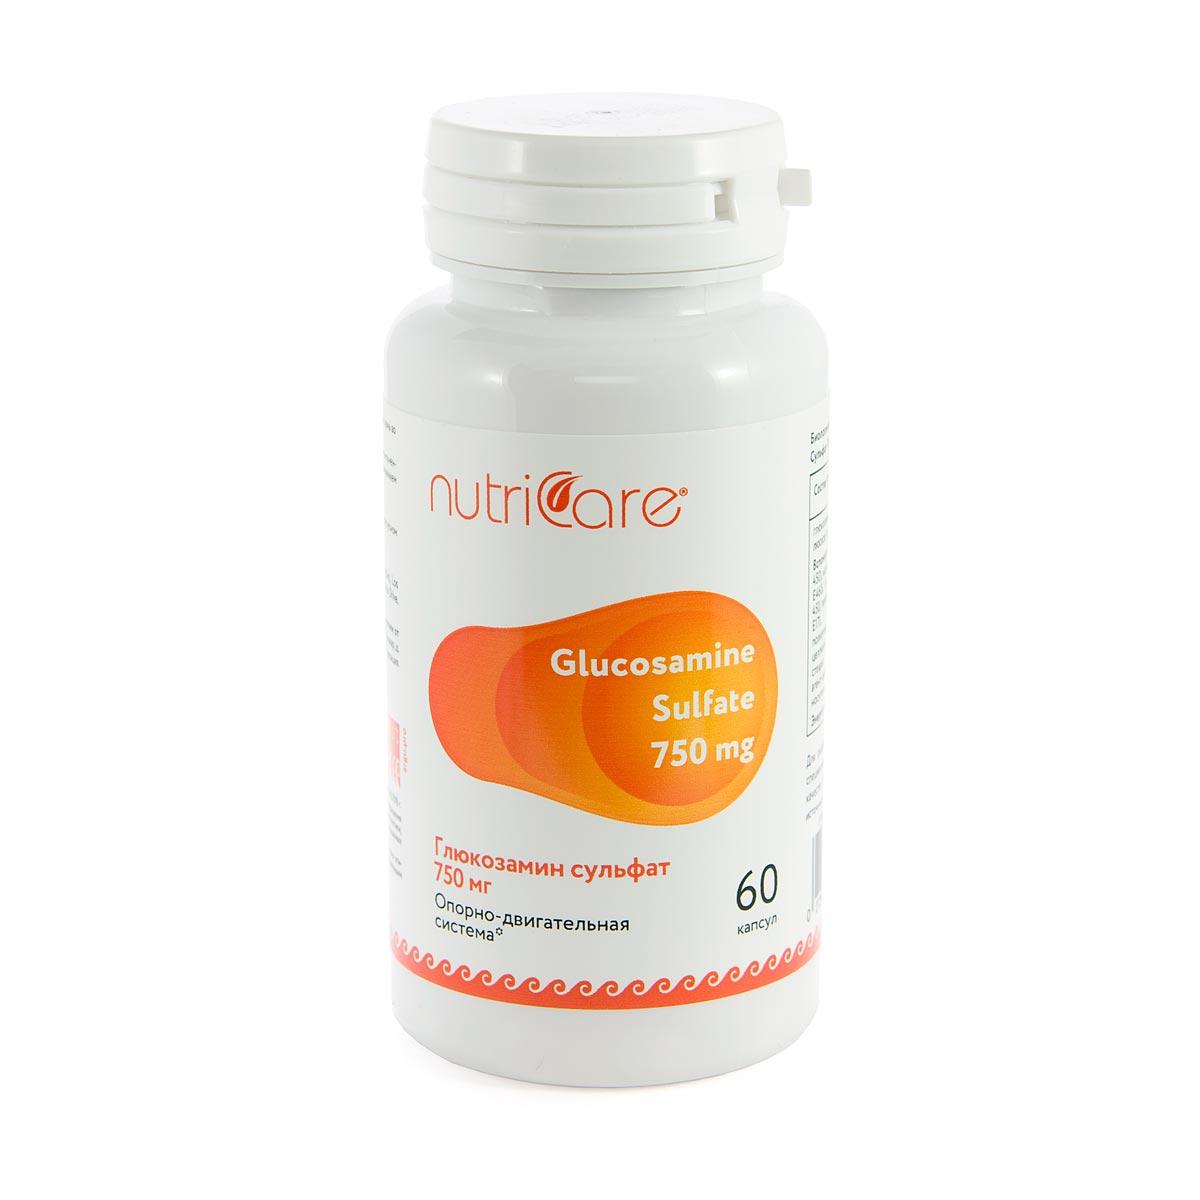 Глюкозамин Сульфат 750 мг NutriCare Int. капсулы 60 шт.